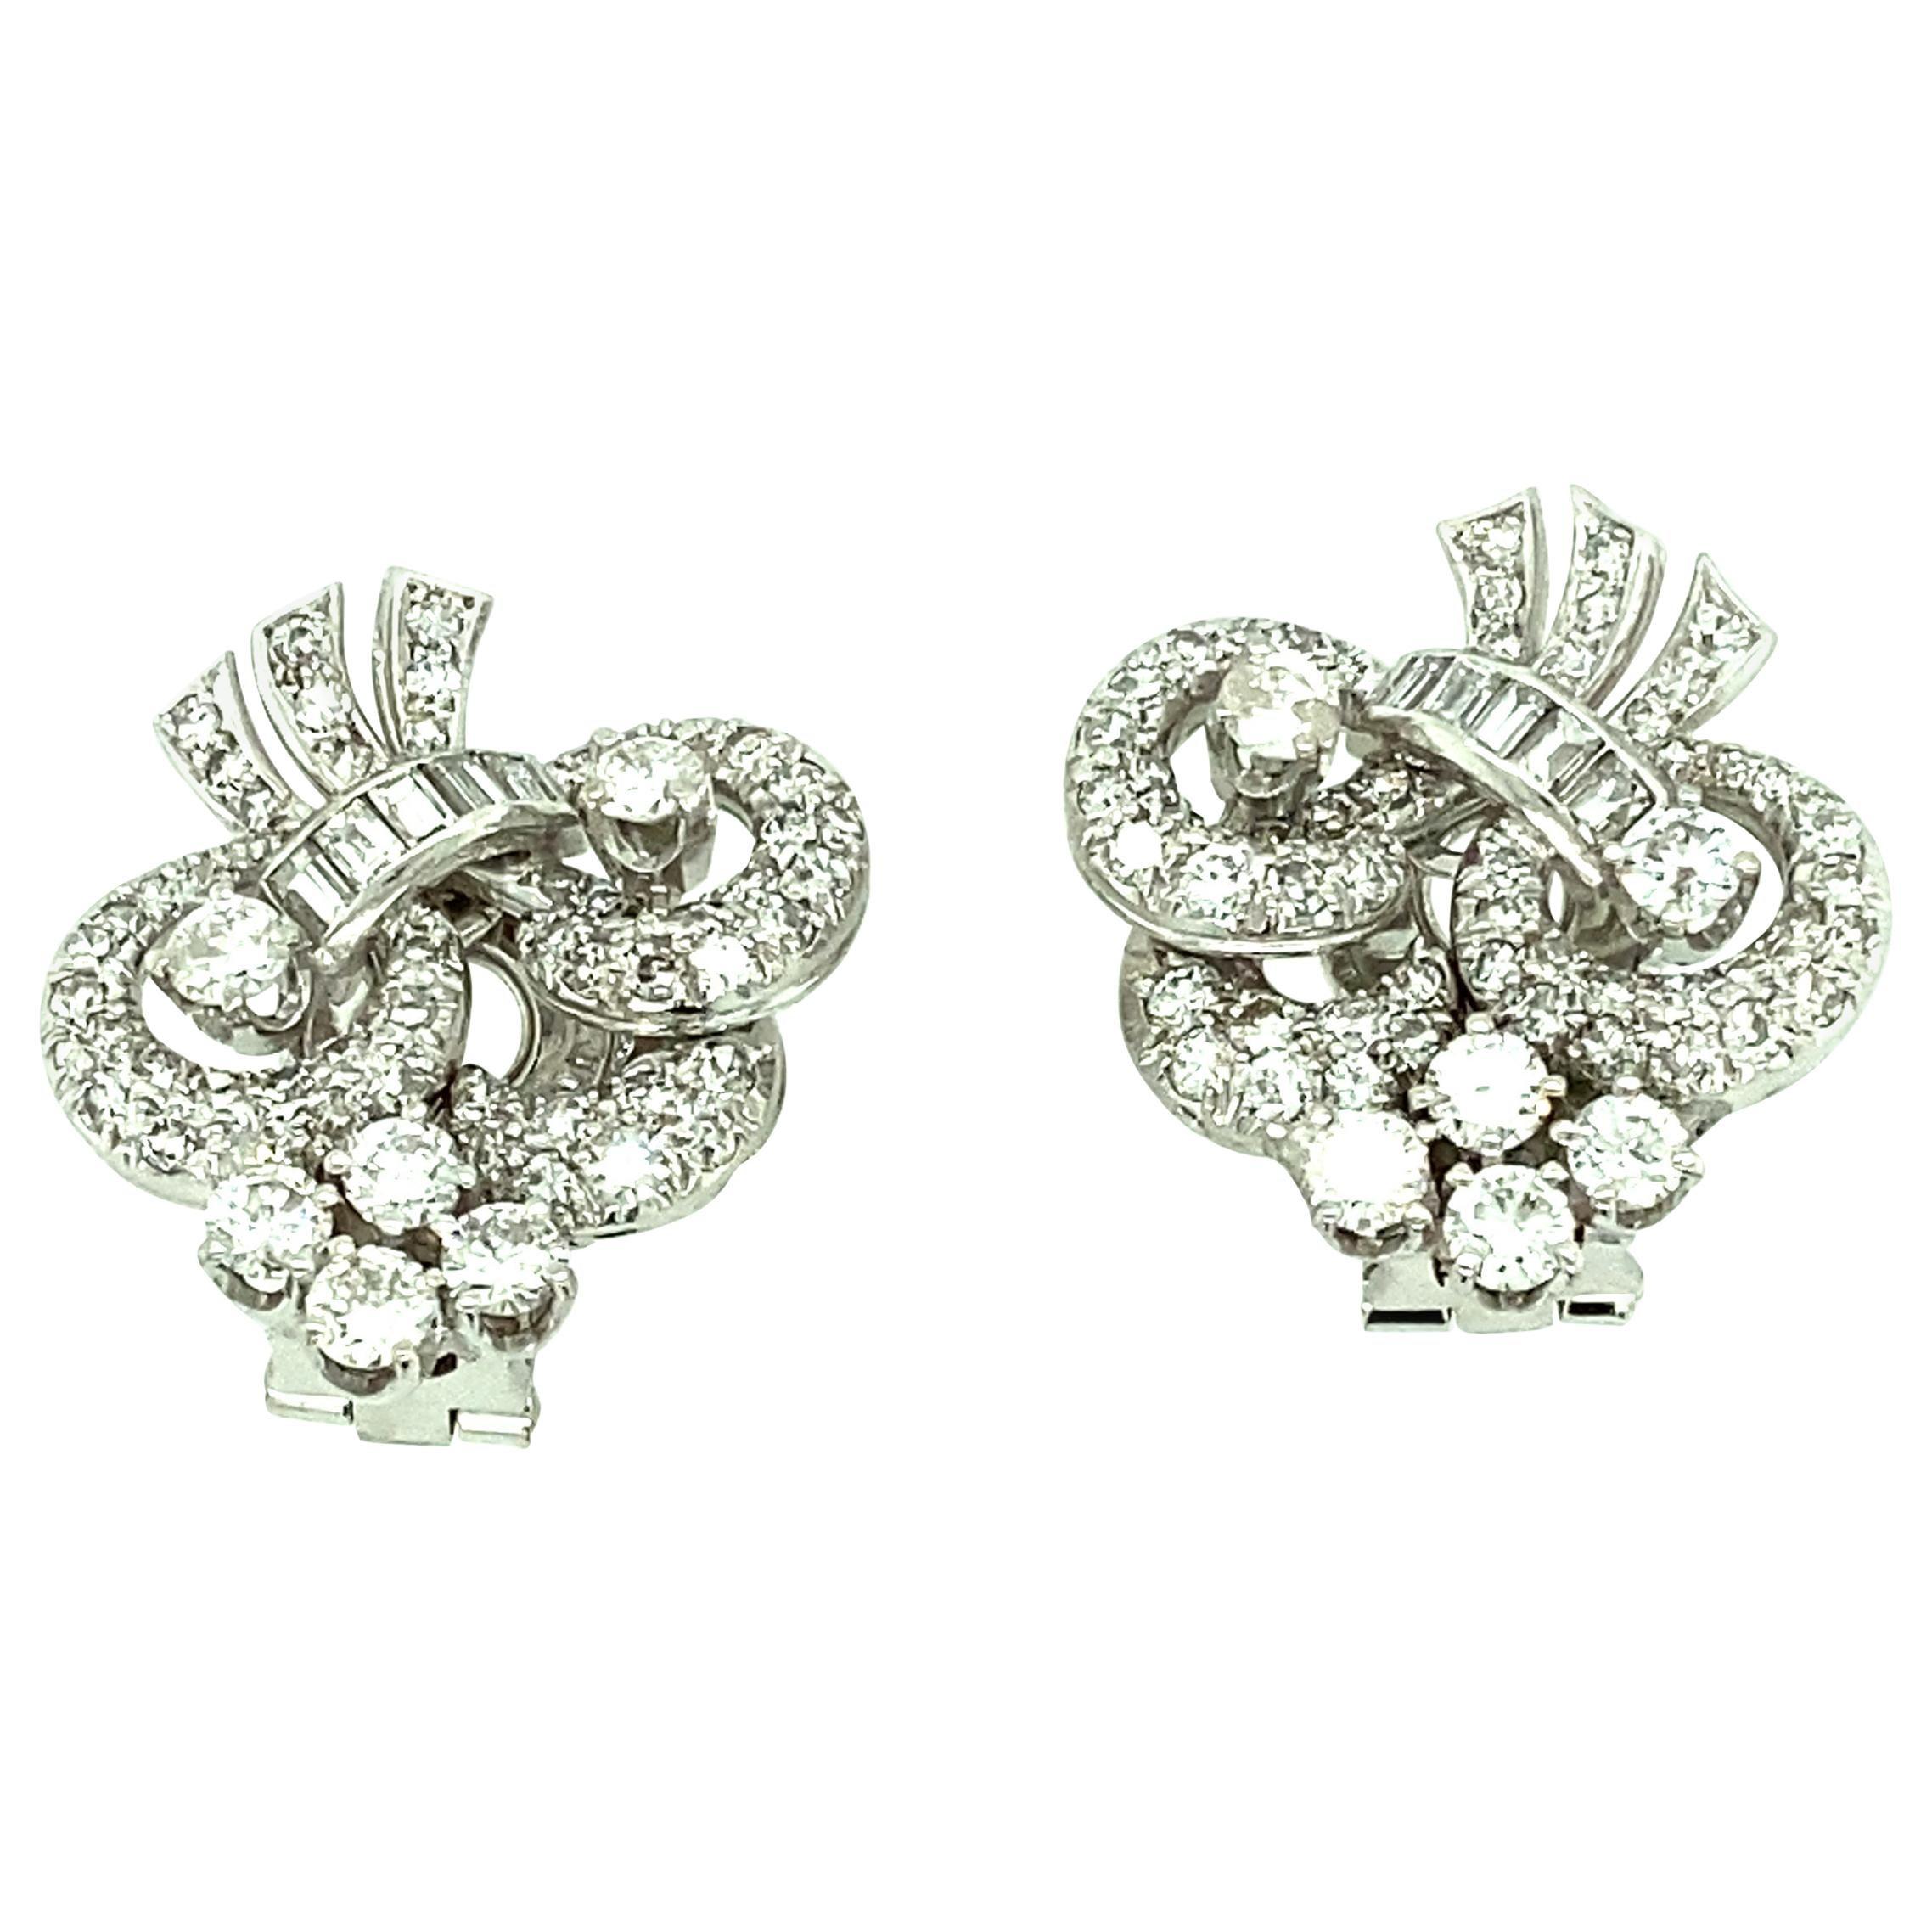 1940s Platinum Diamond Clip-On Earrings